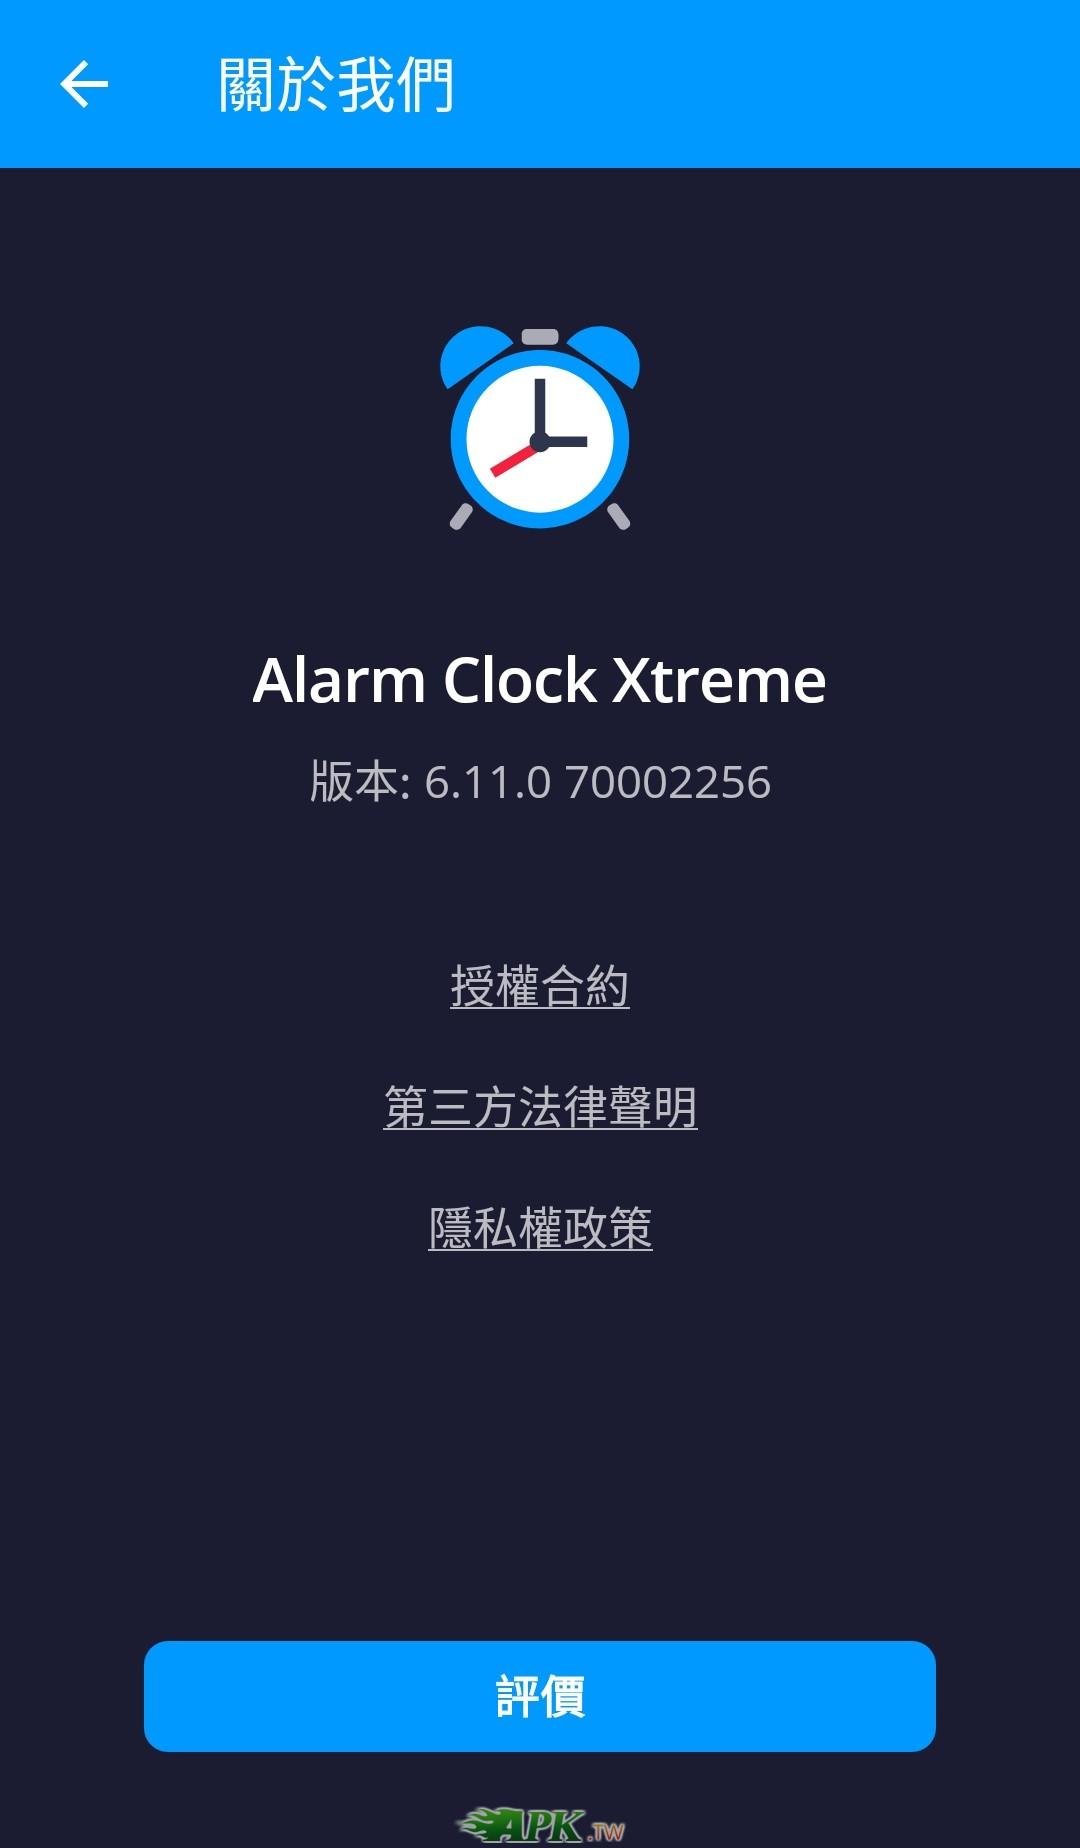 AlarmClockXtreme__3_.jpg